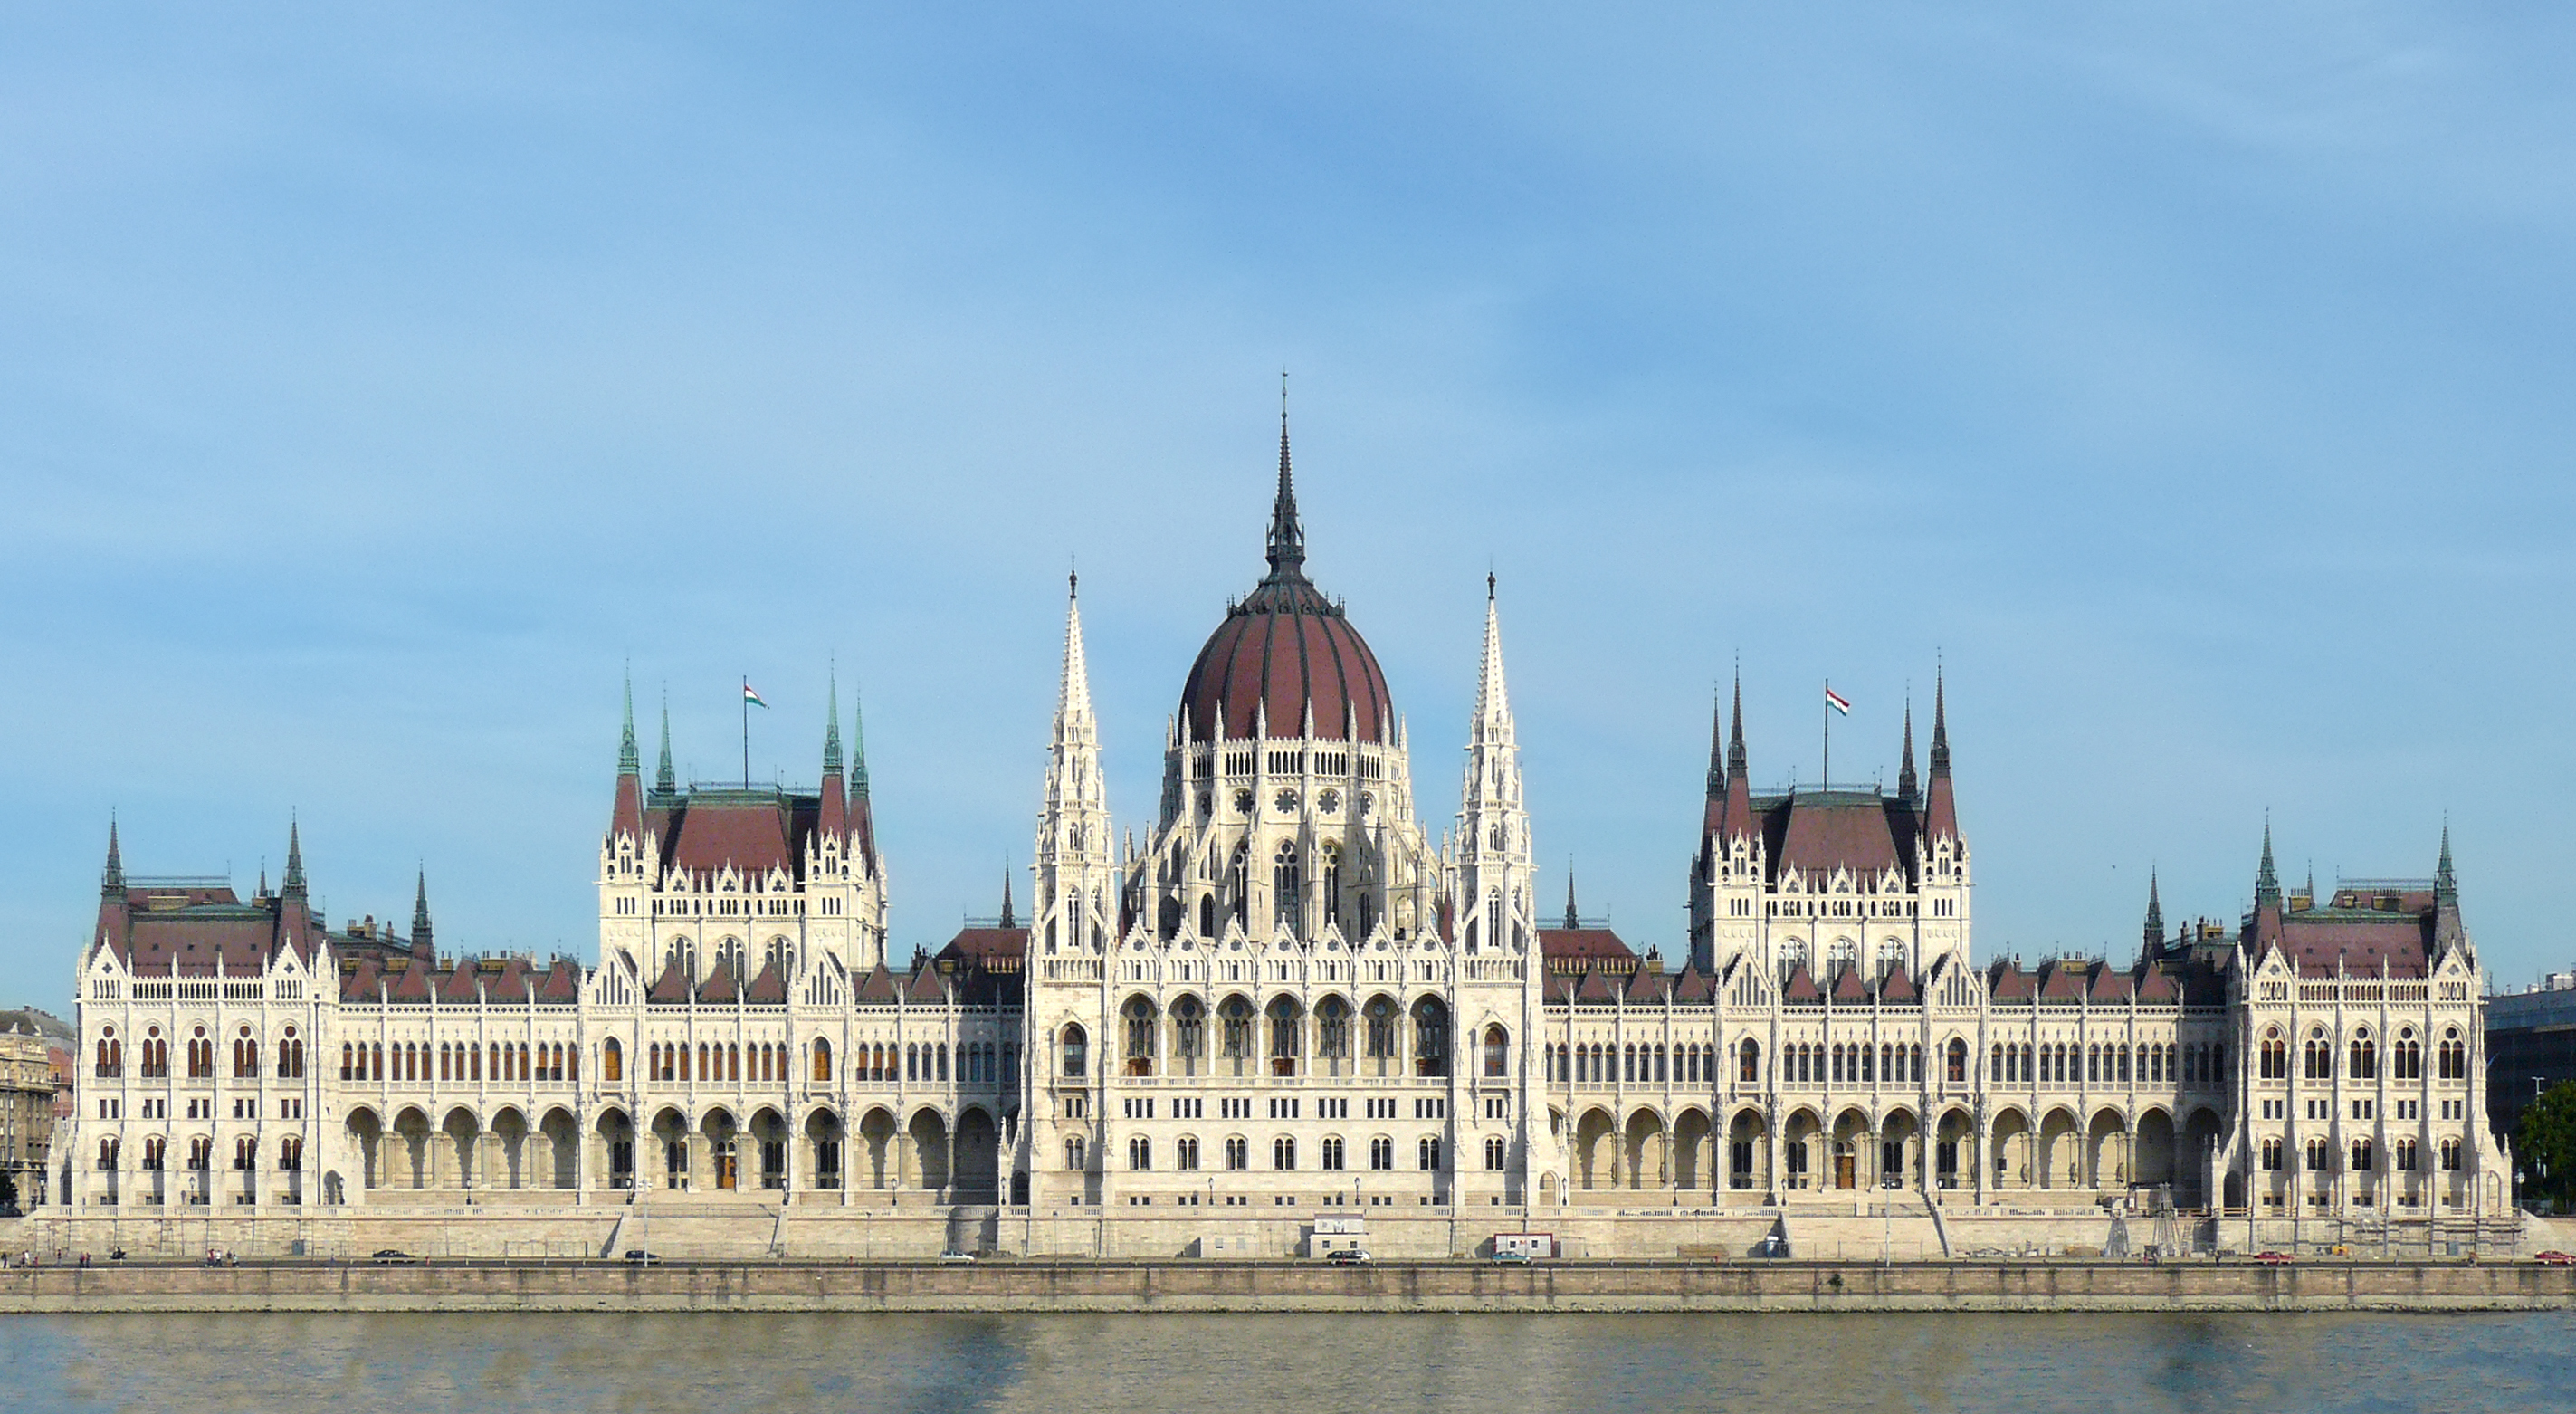 Hungarian Parliament Building, Budapest. Photo taken on September 20, 2009.